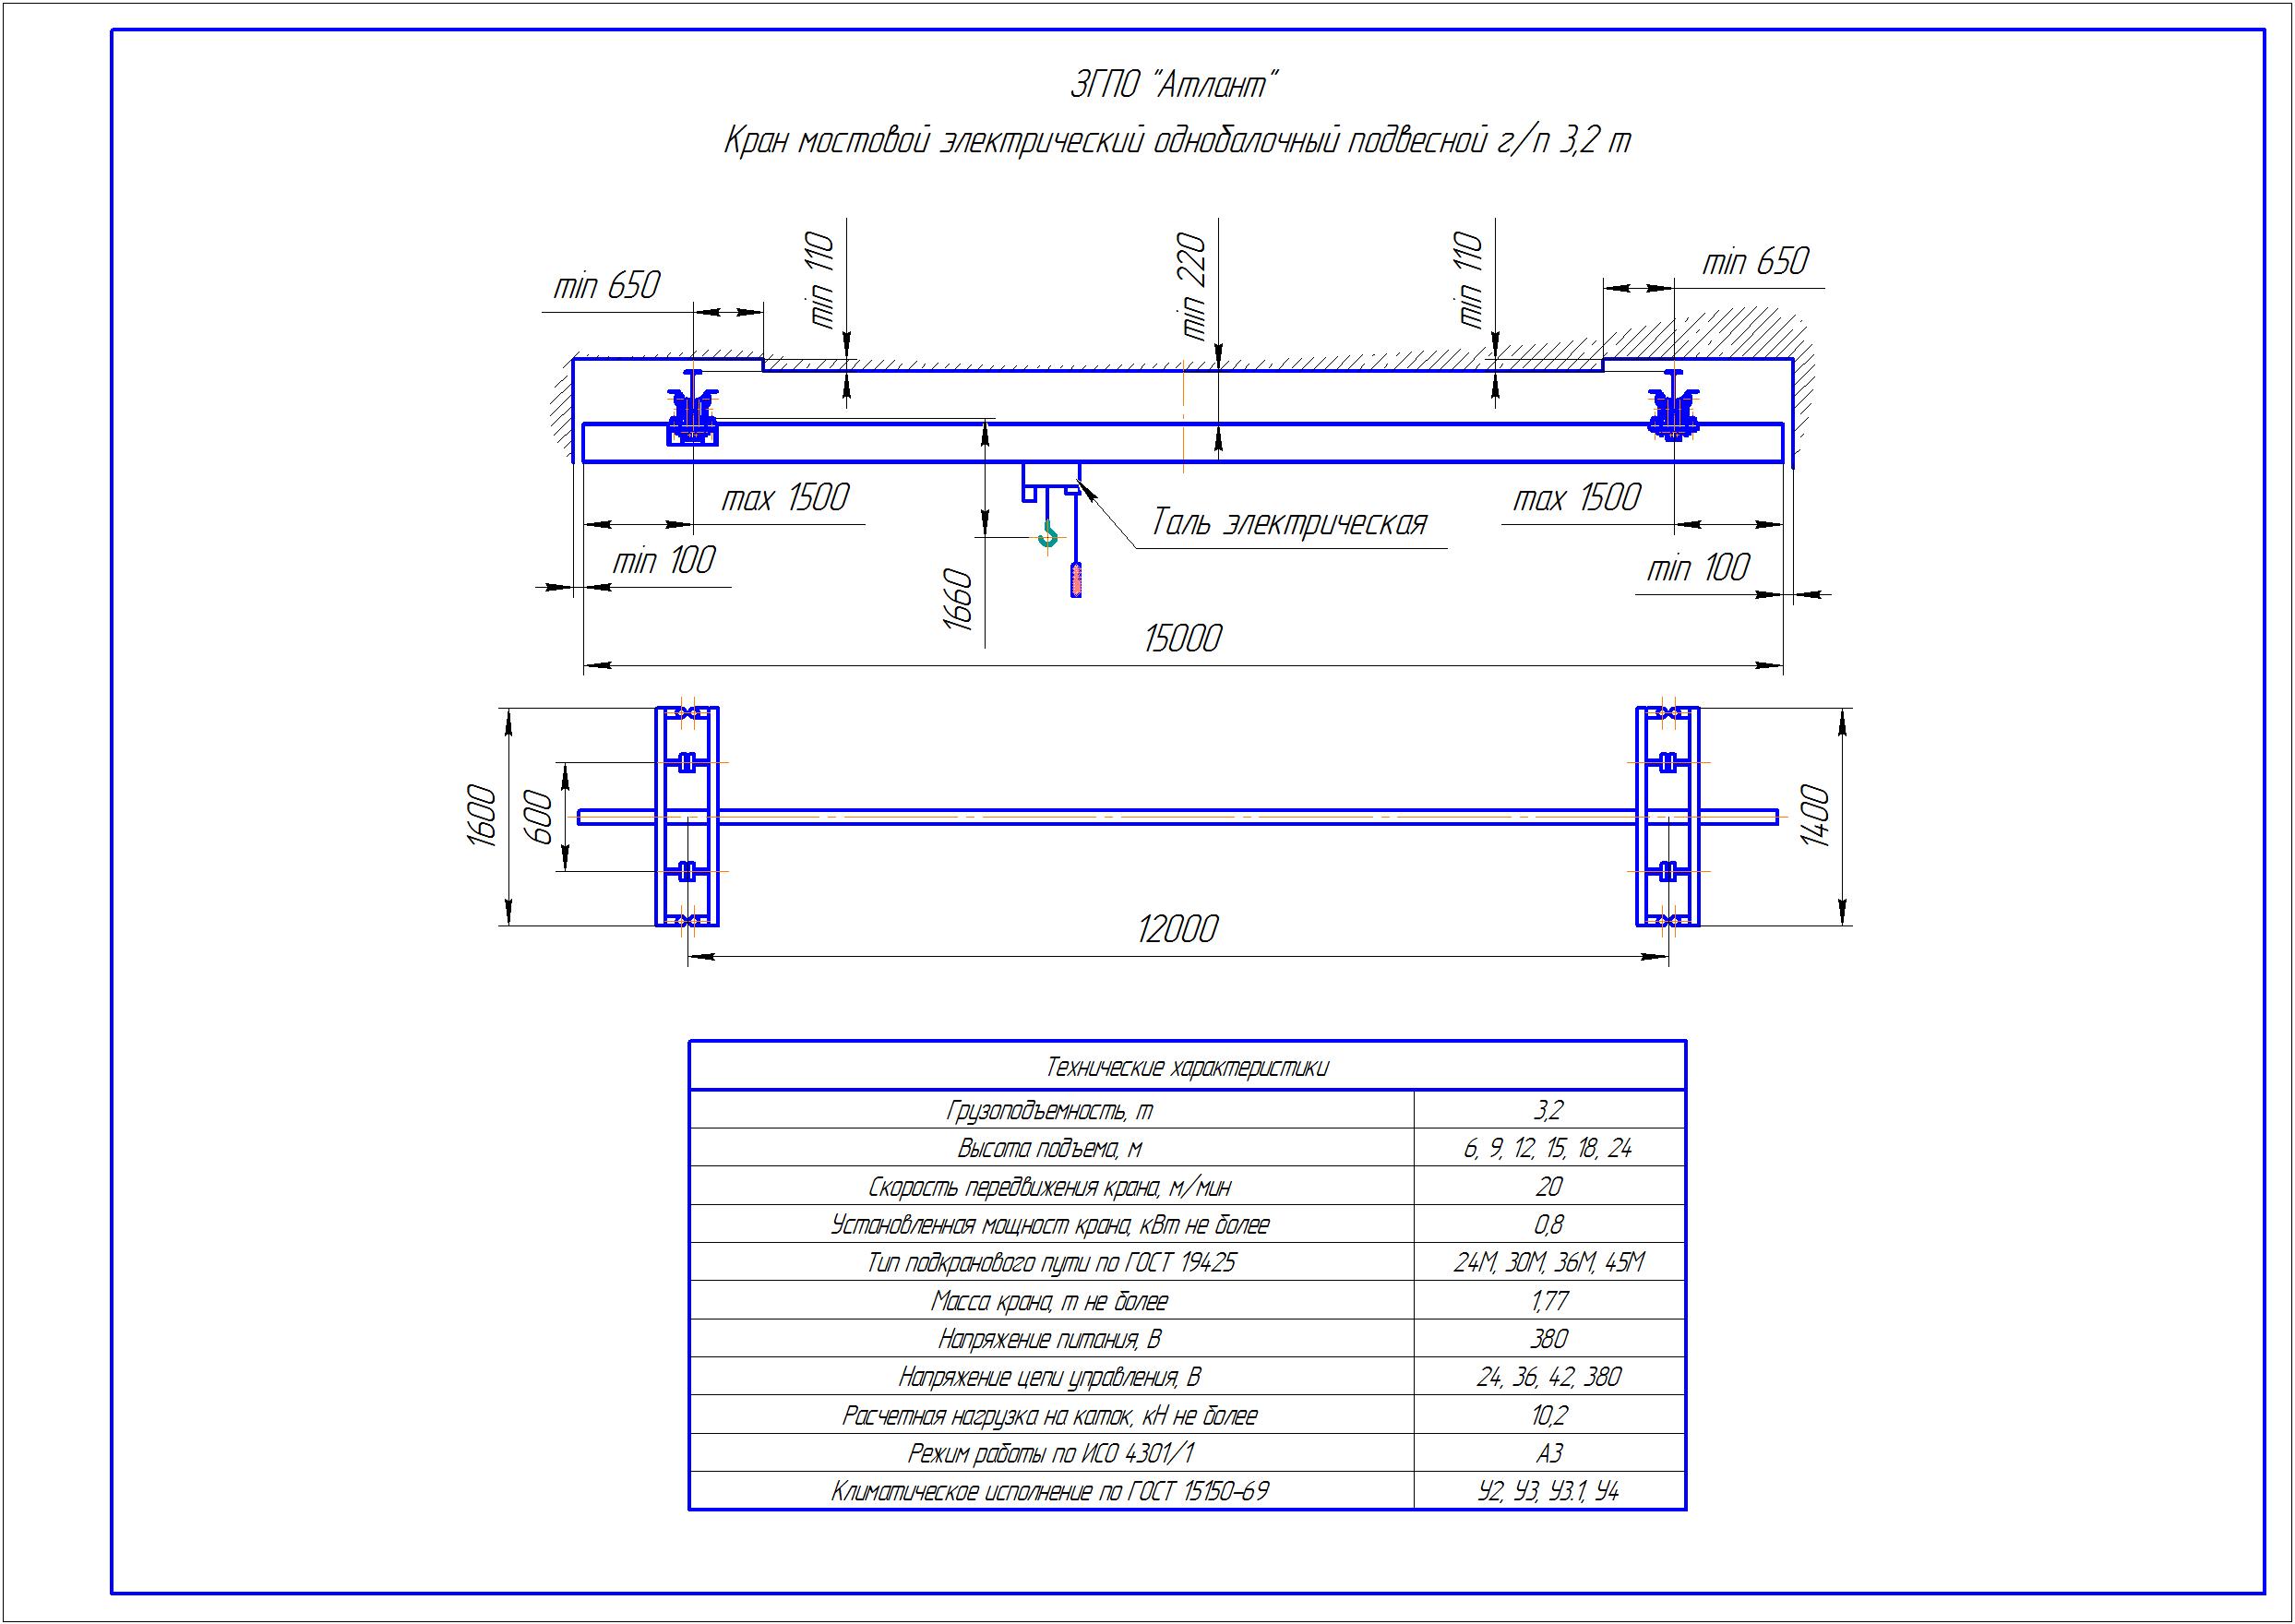 KBP 3 4 - Подвесная кран балка